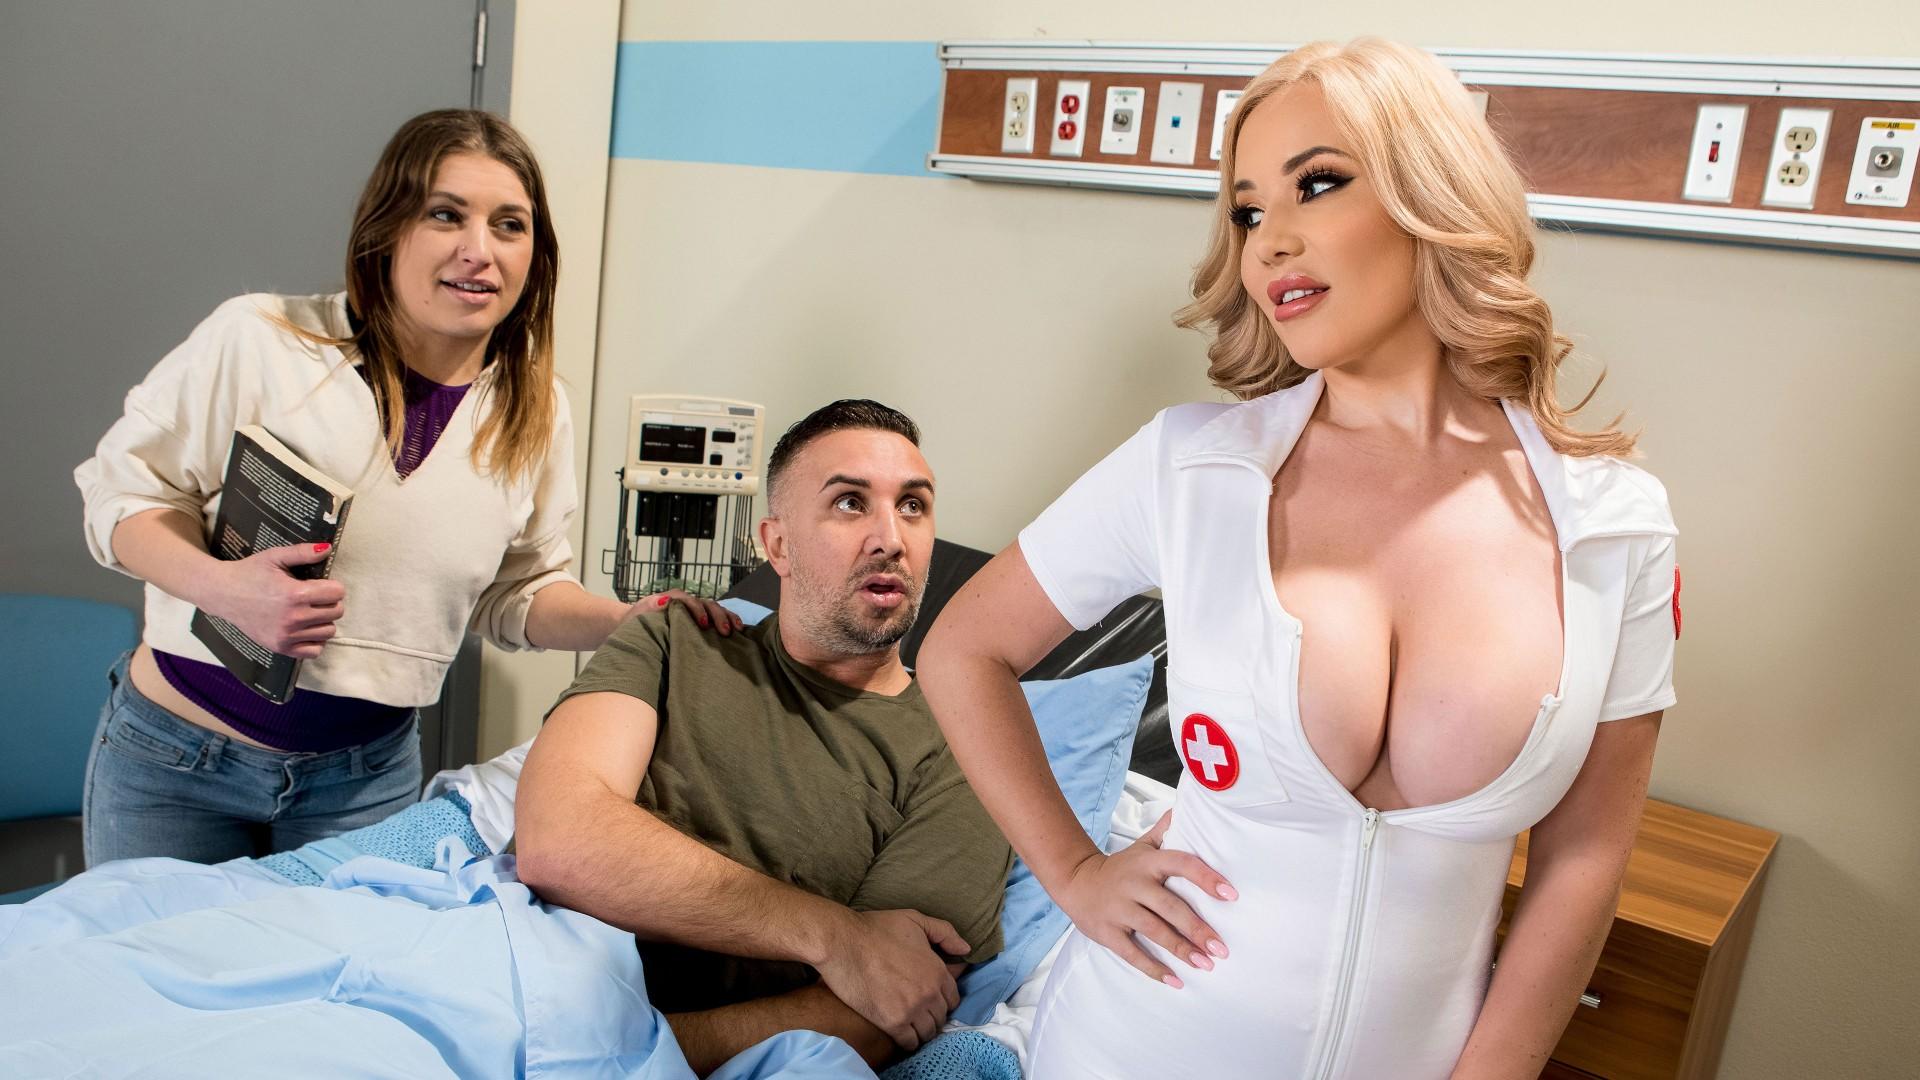 Nurse's Touch - Doctor Adventures